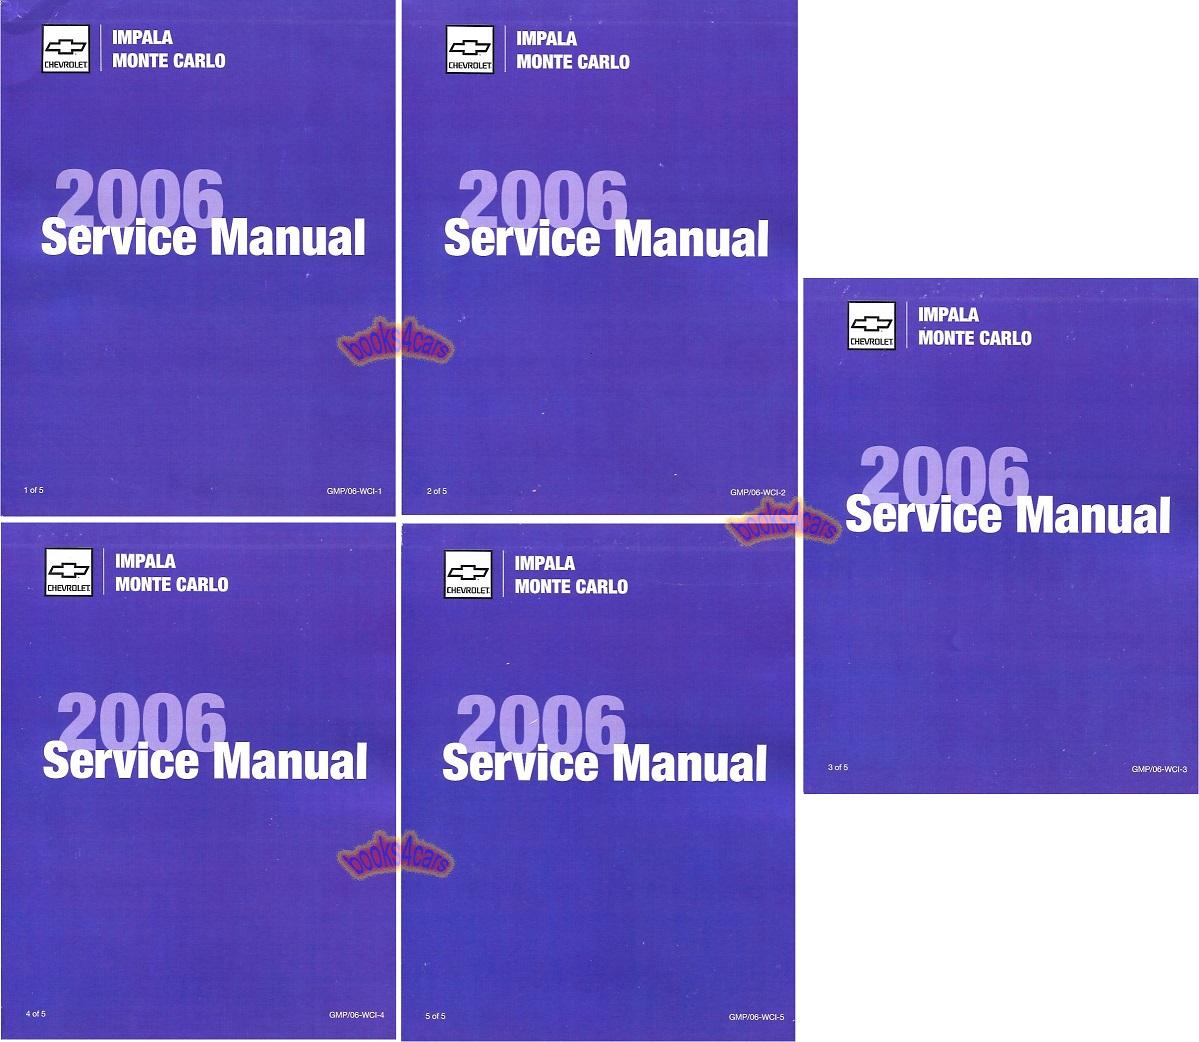 Shop Manual Impala 2006 Monte Carlo Chevrolet Service